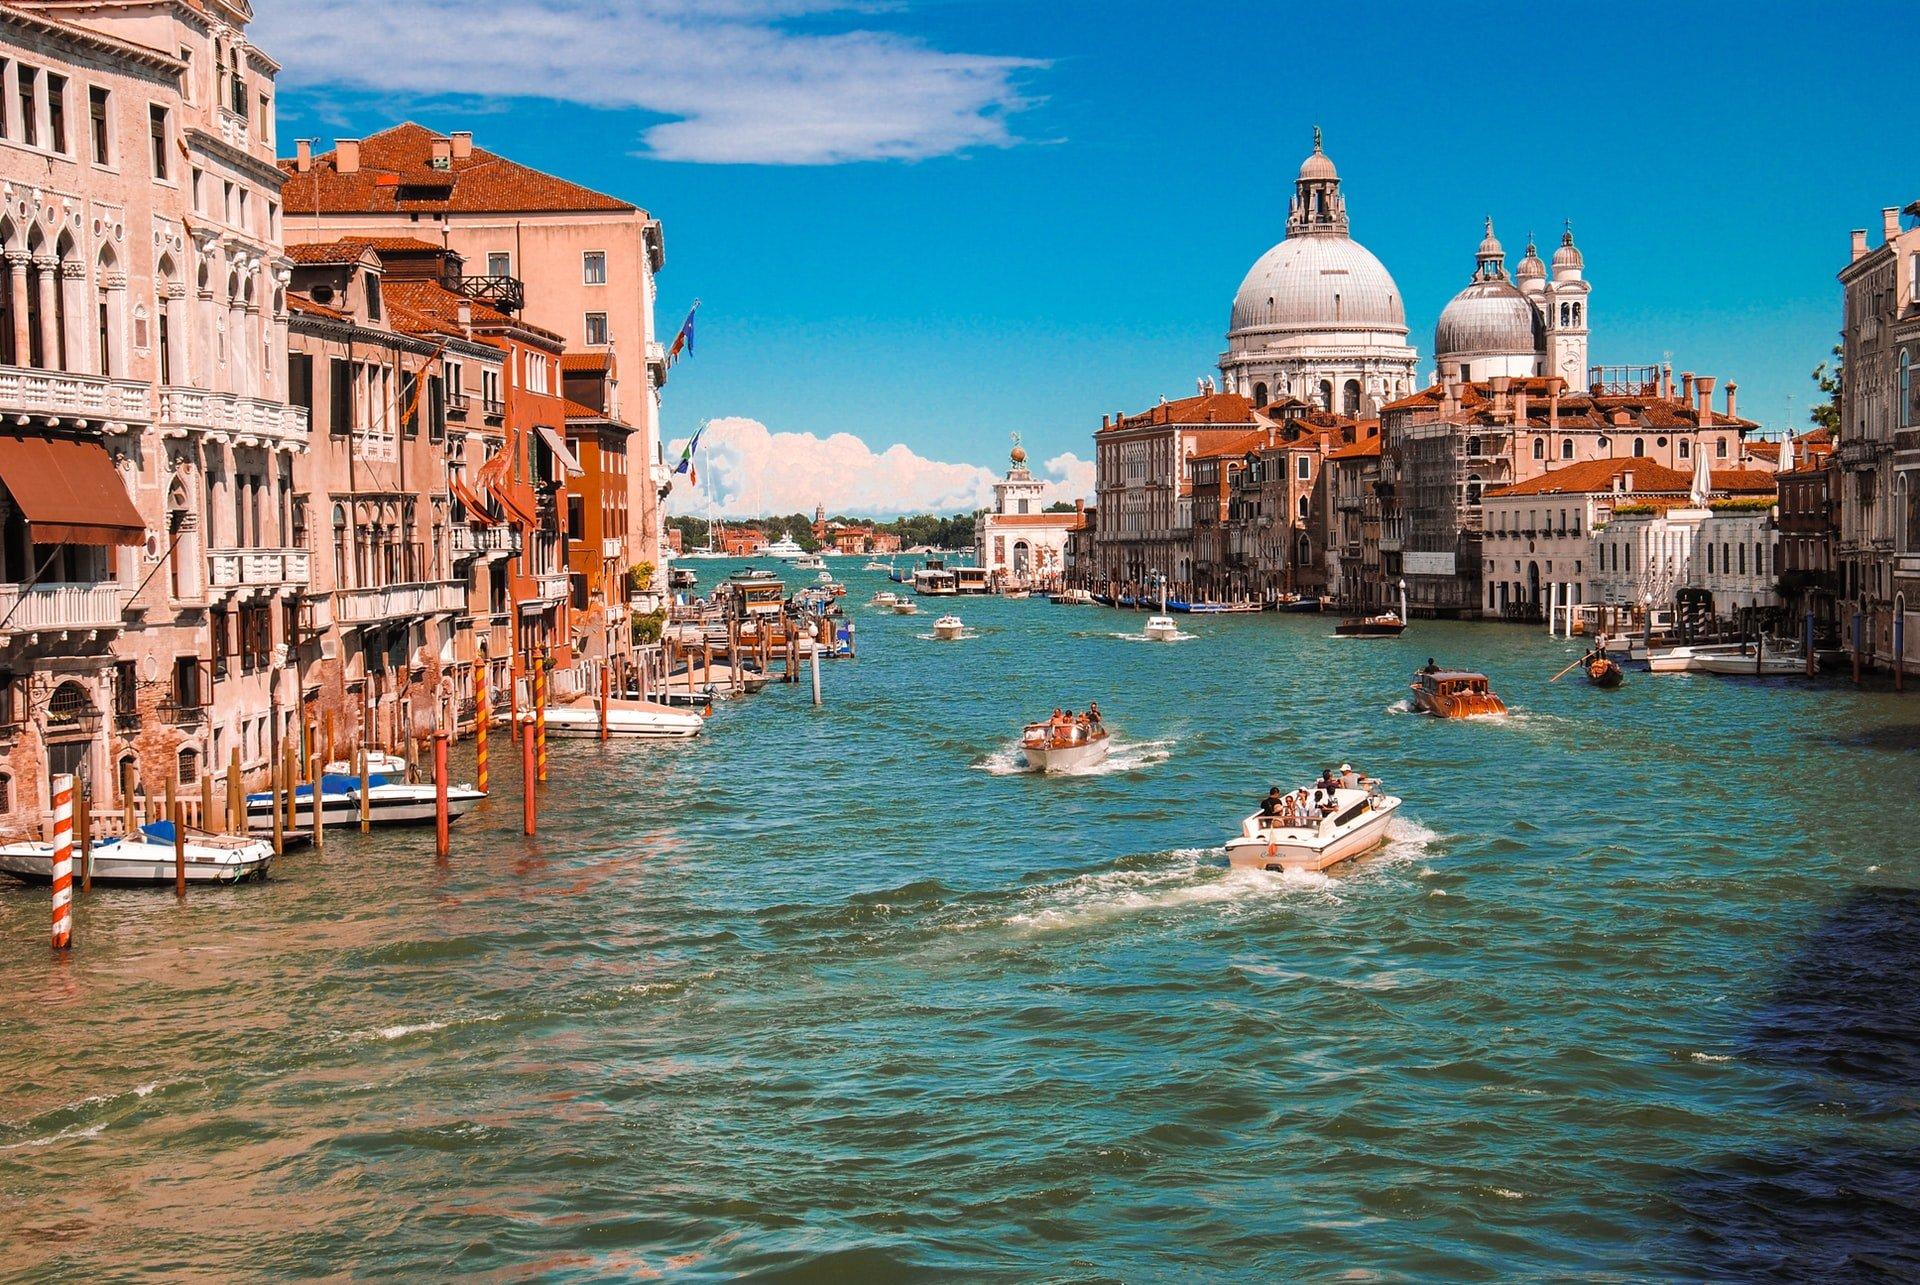 Metropolitan City of Venice, Italy.